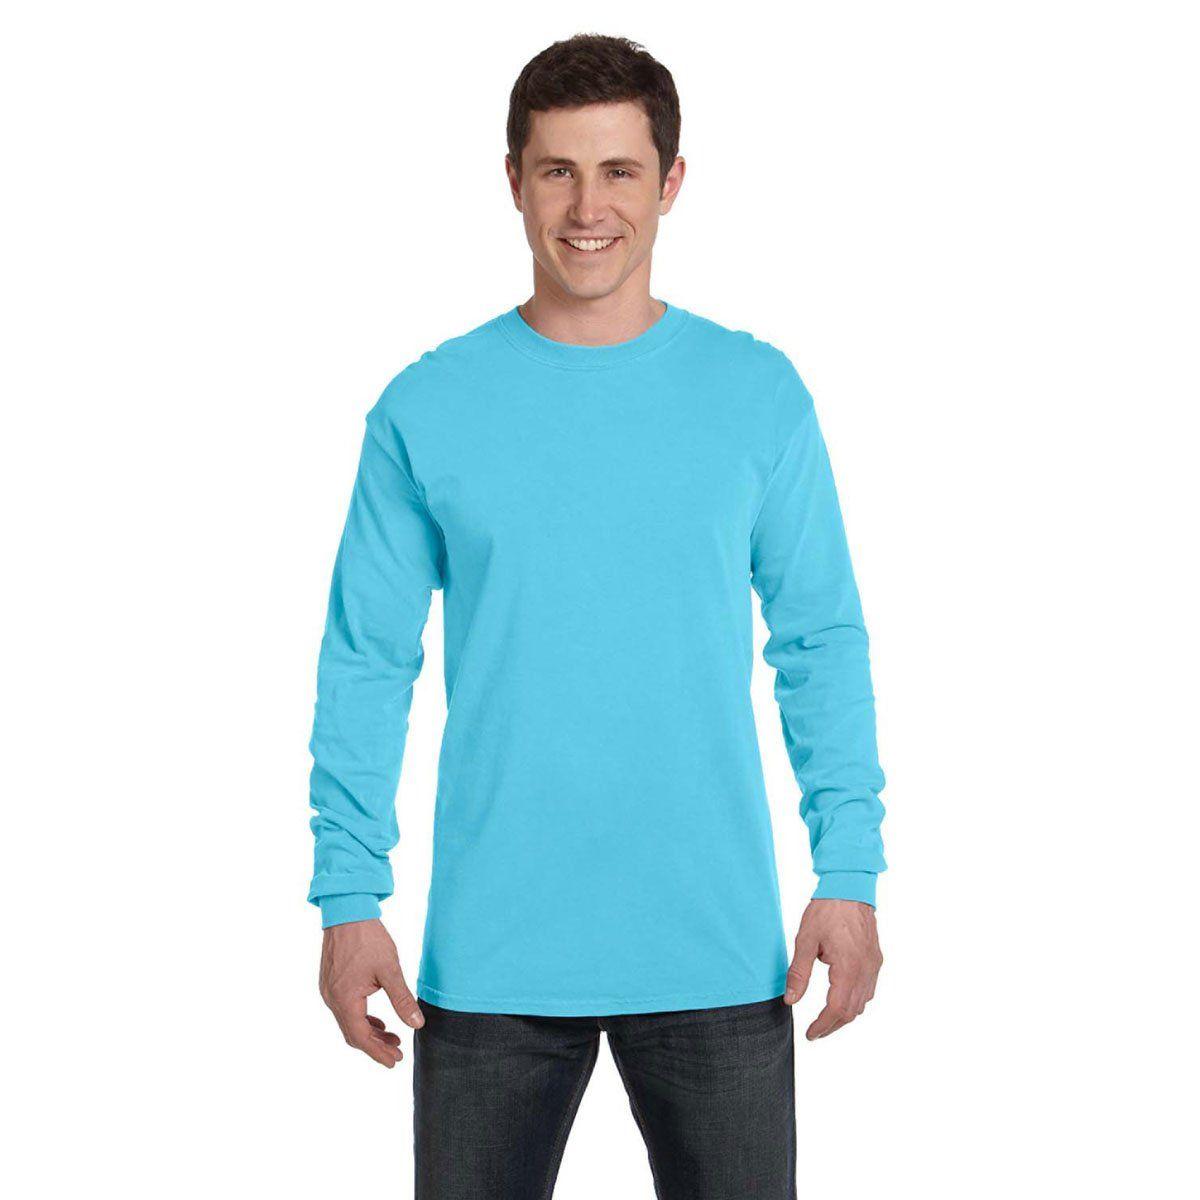 Comfort Colors Men S Lagoon Blue 6 1 Oz Long Sleeve T Shirt Dye